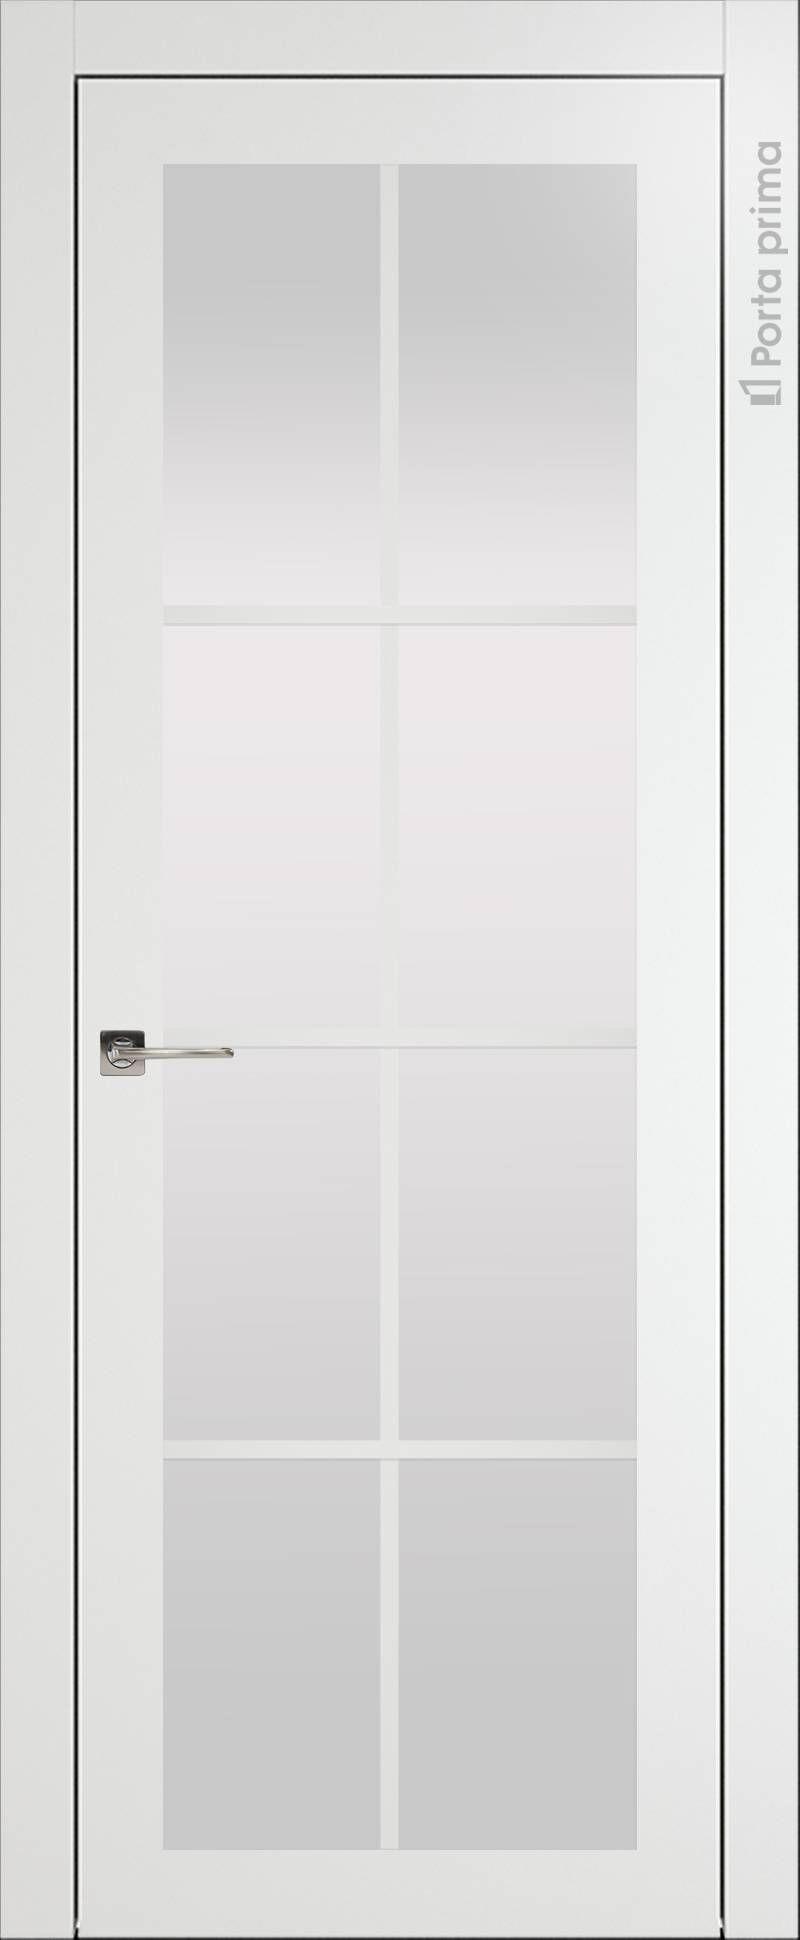 Tivoli З-5 цвет - Белая эмаль (RAL 9003) Со стеклом (ДО)